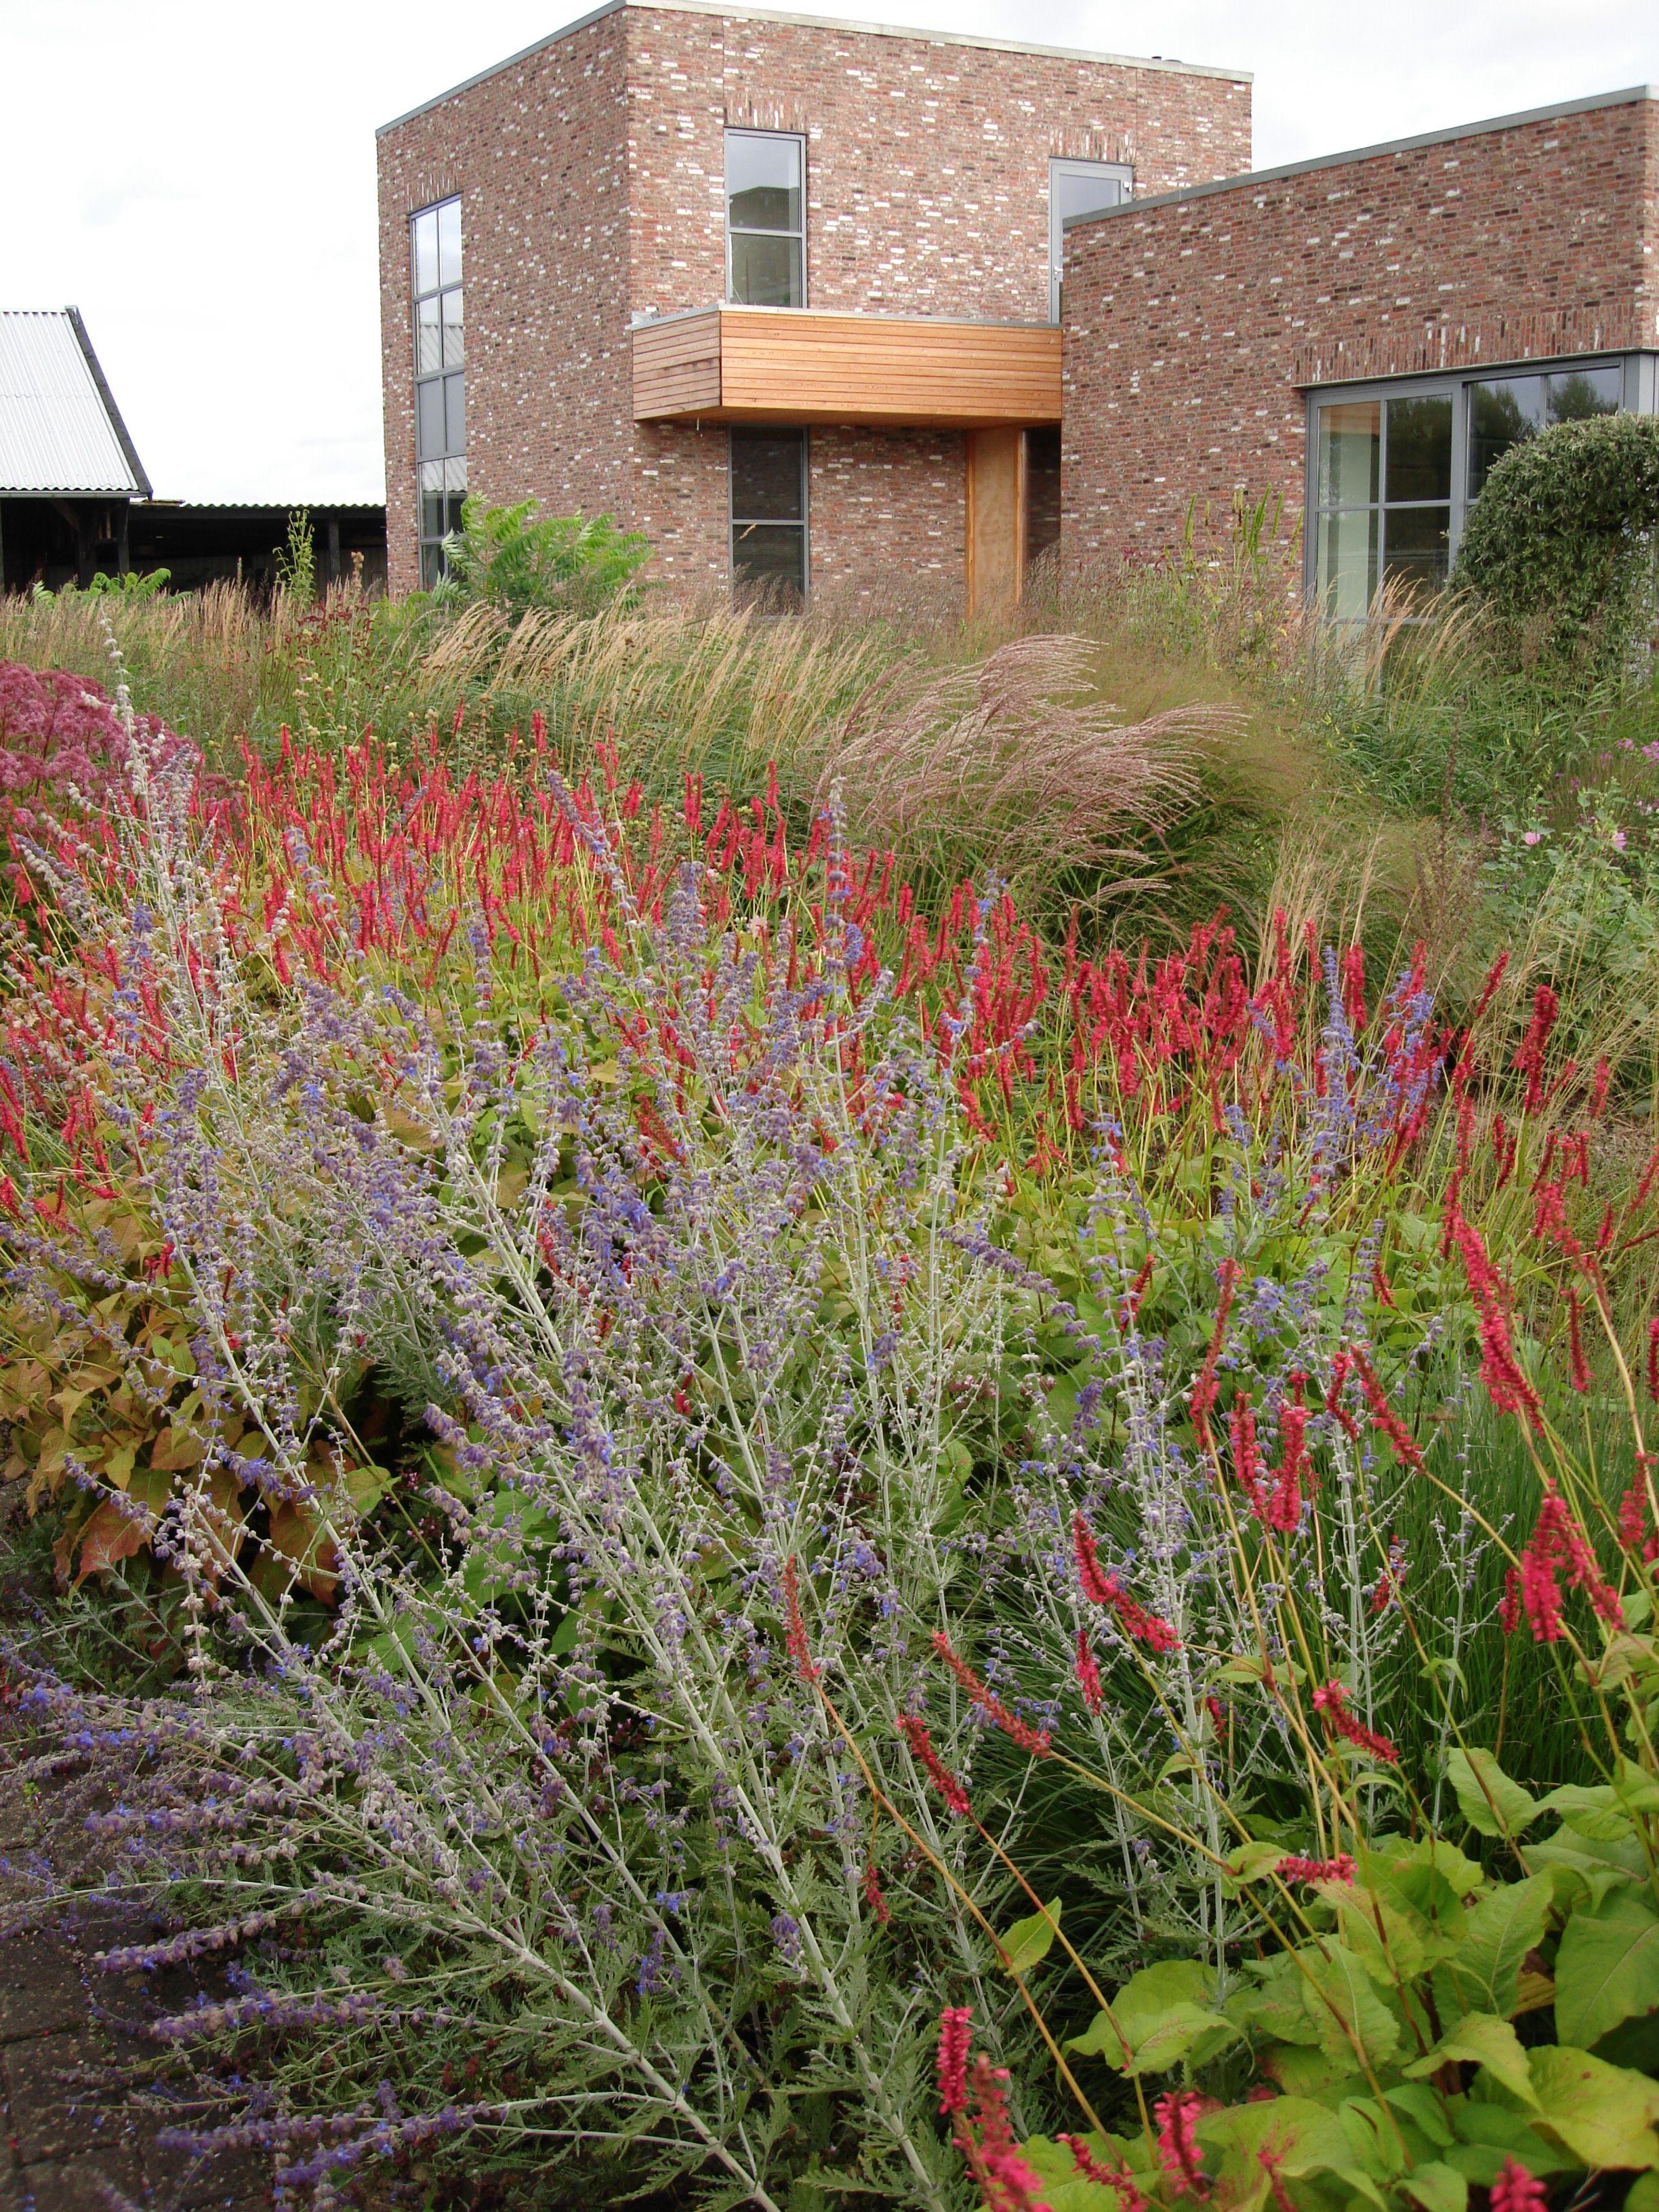 NL - Hummelo Garden Piet Oudolf | GARDENS | Pinterest | Gardens ...